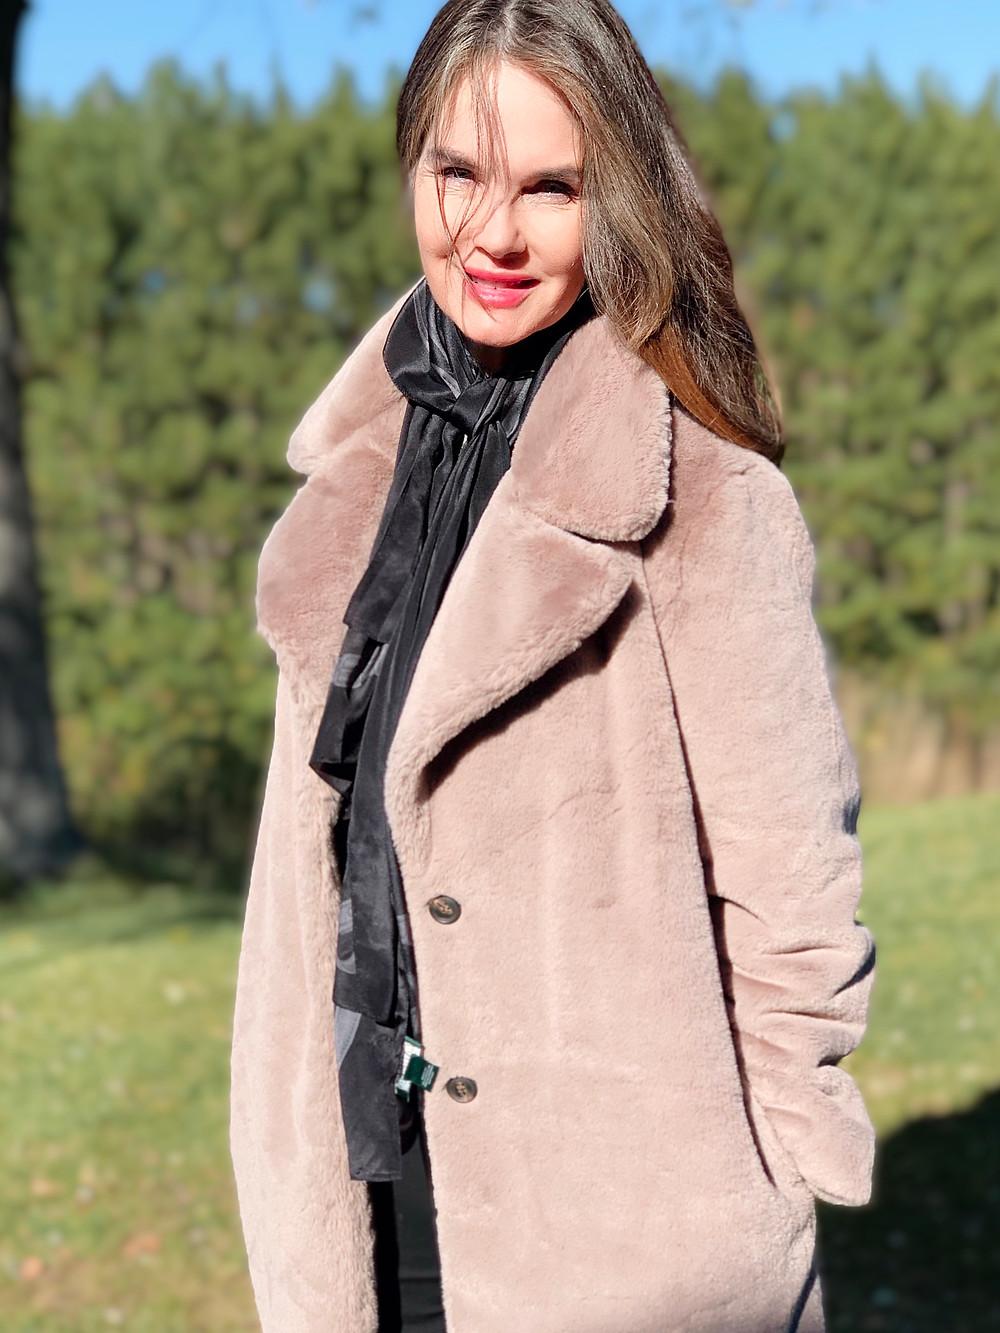 Faux fur coat from Amazon